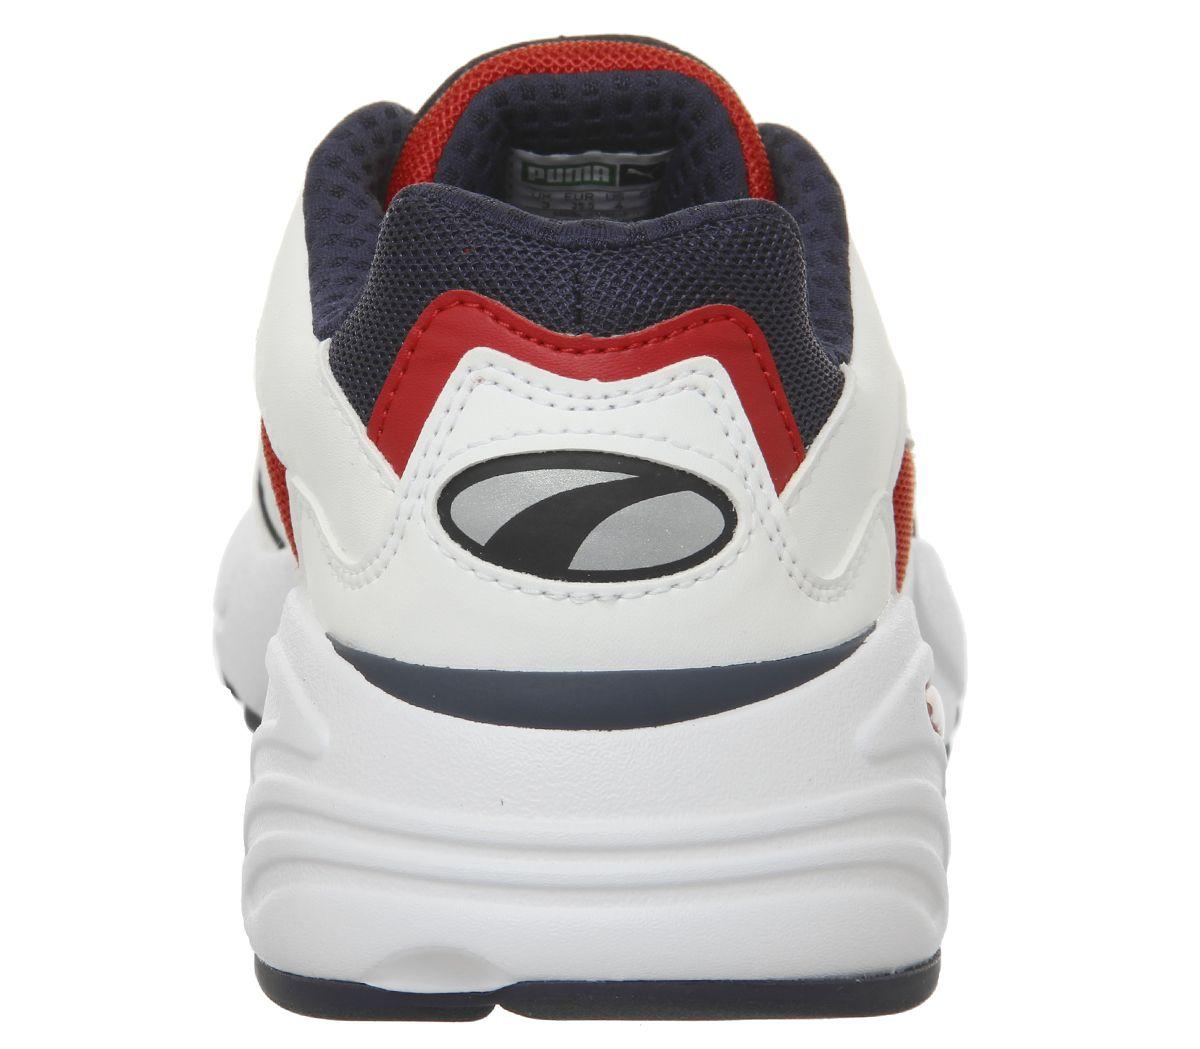 Homme-Puma-Cell-Viper-Baskets-PUMA-blanc-Risque-Eleve-Rouge-Baskets miniature 7